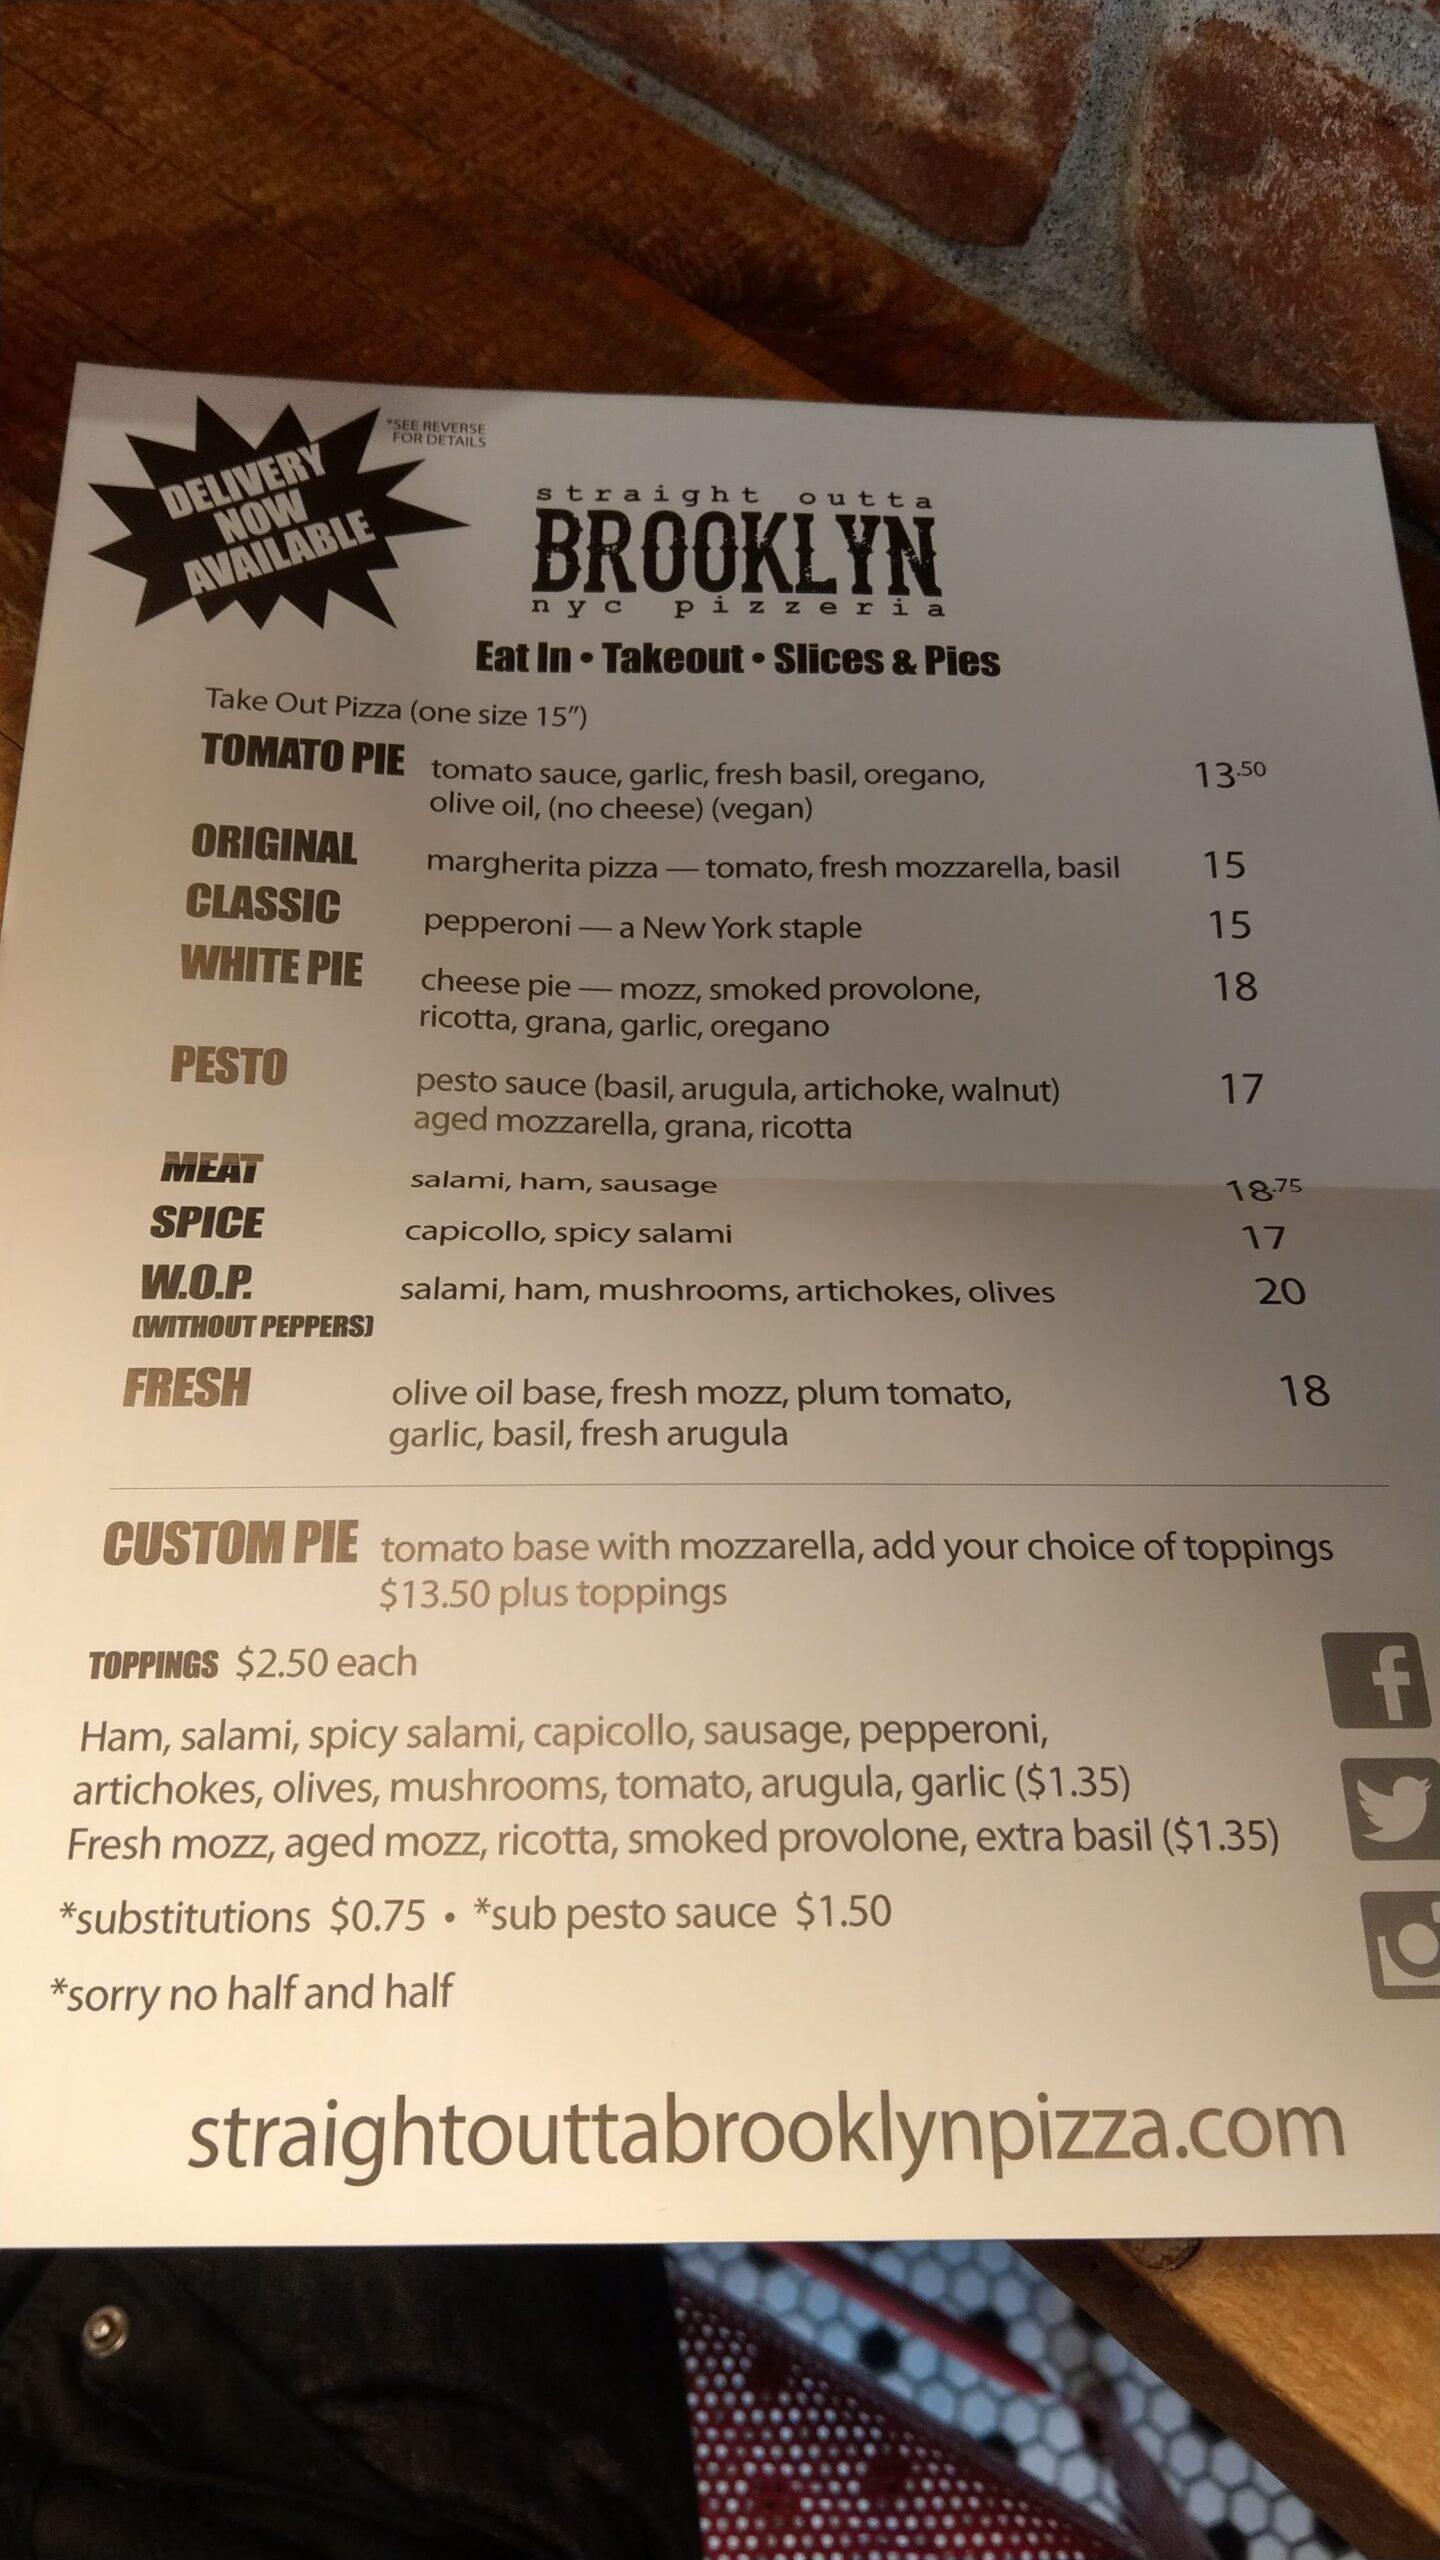 Straight Outta Brooklyn NYC Pizzeriaのメニュー